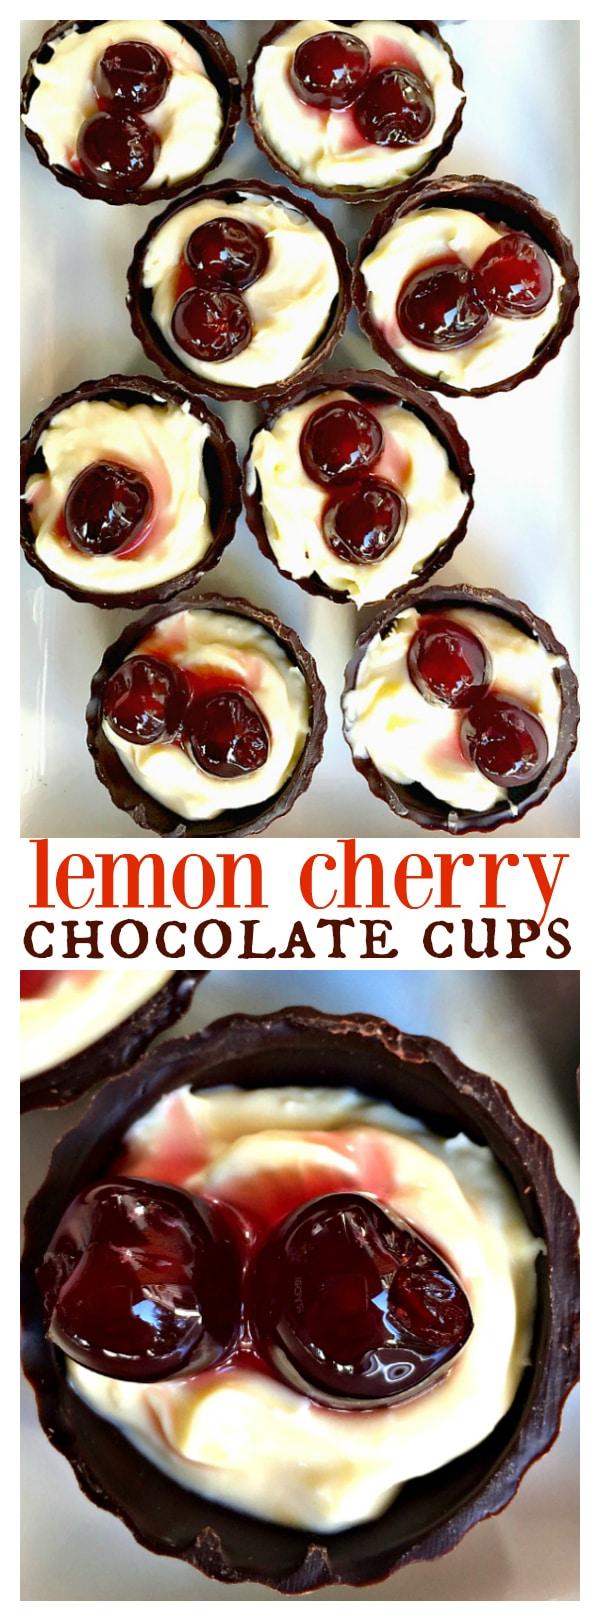 Lemon Cherry Chocolate Cups for easy entertaining